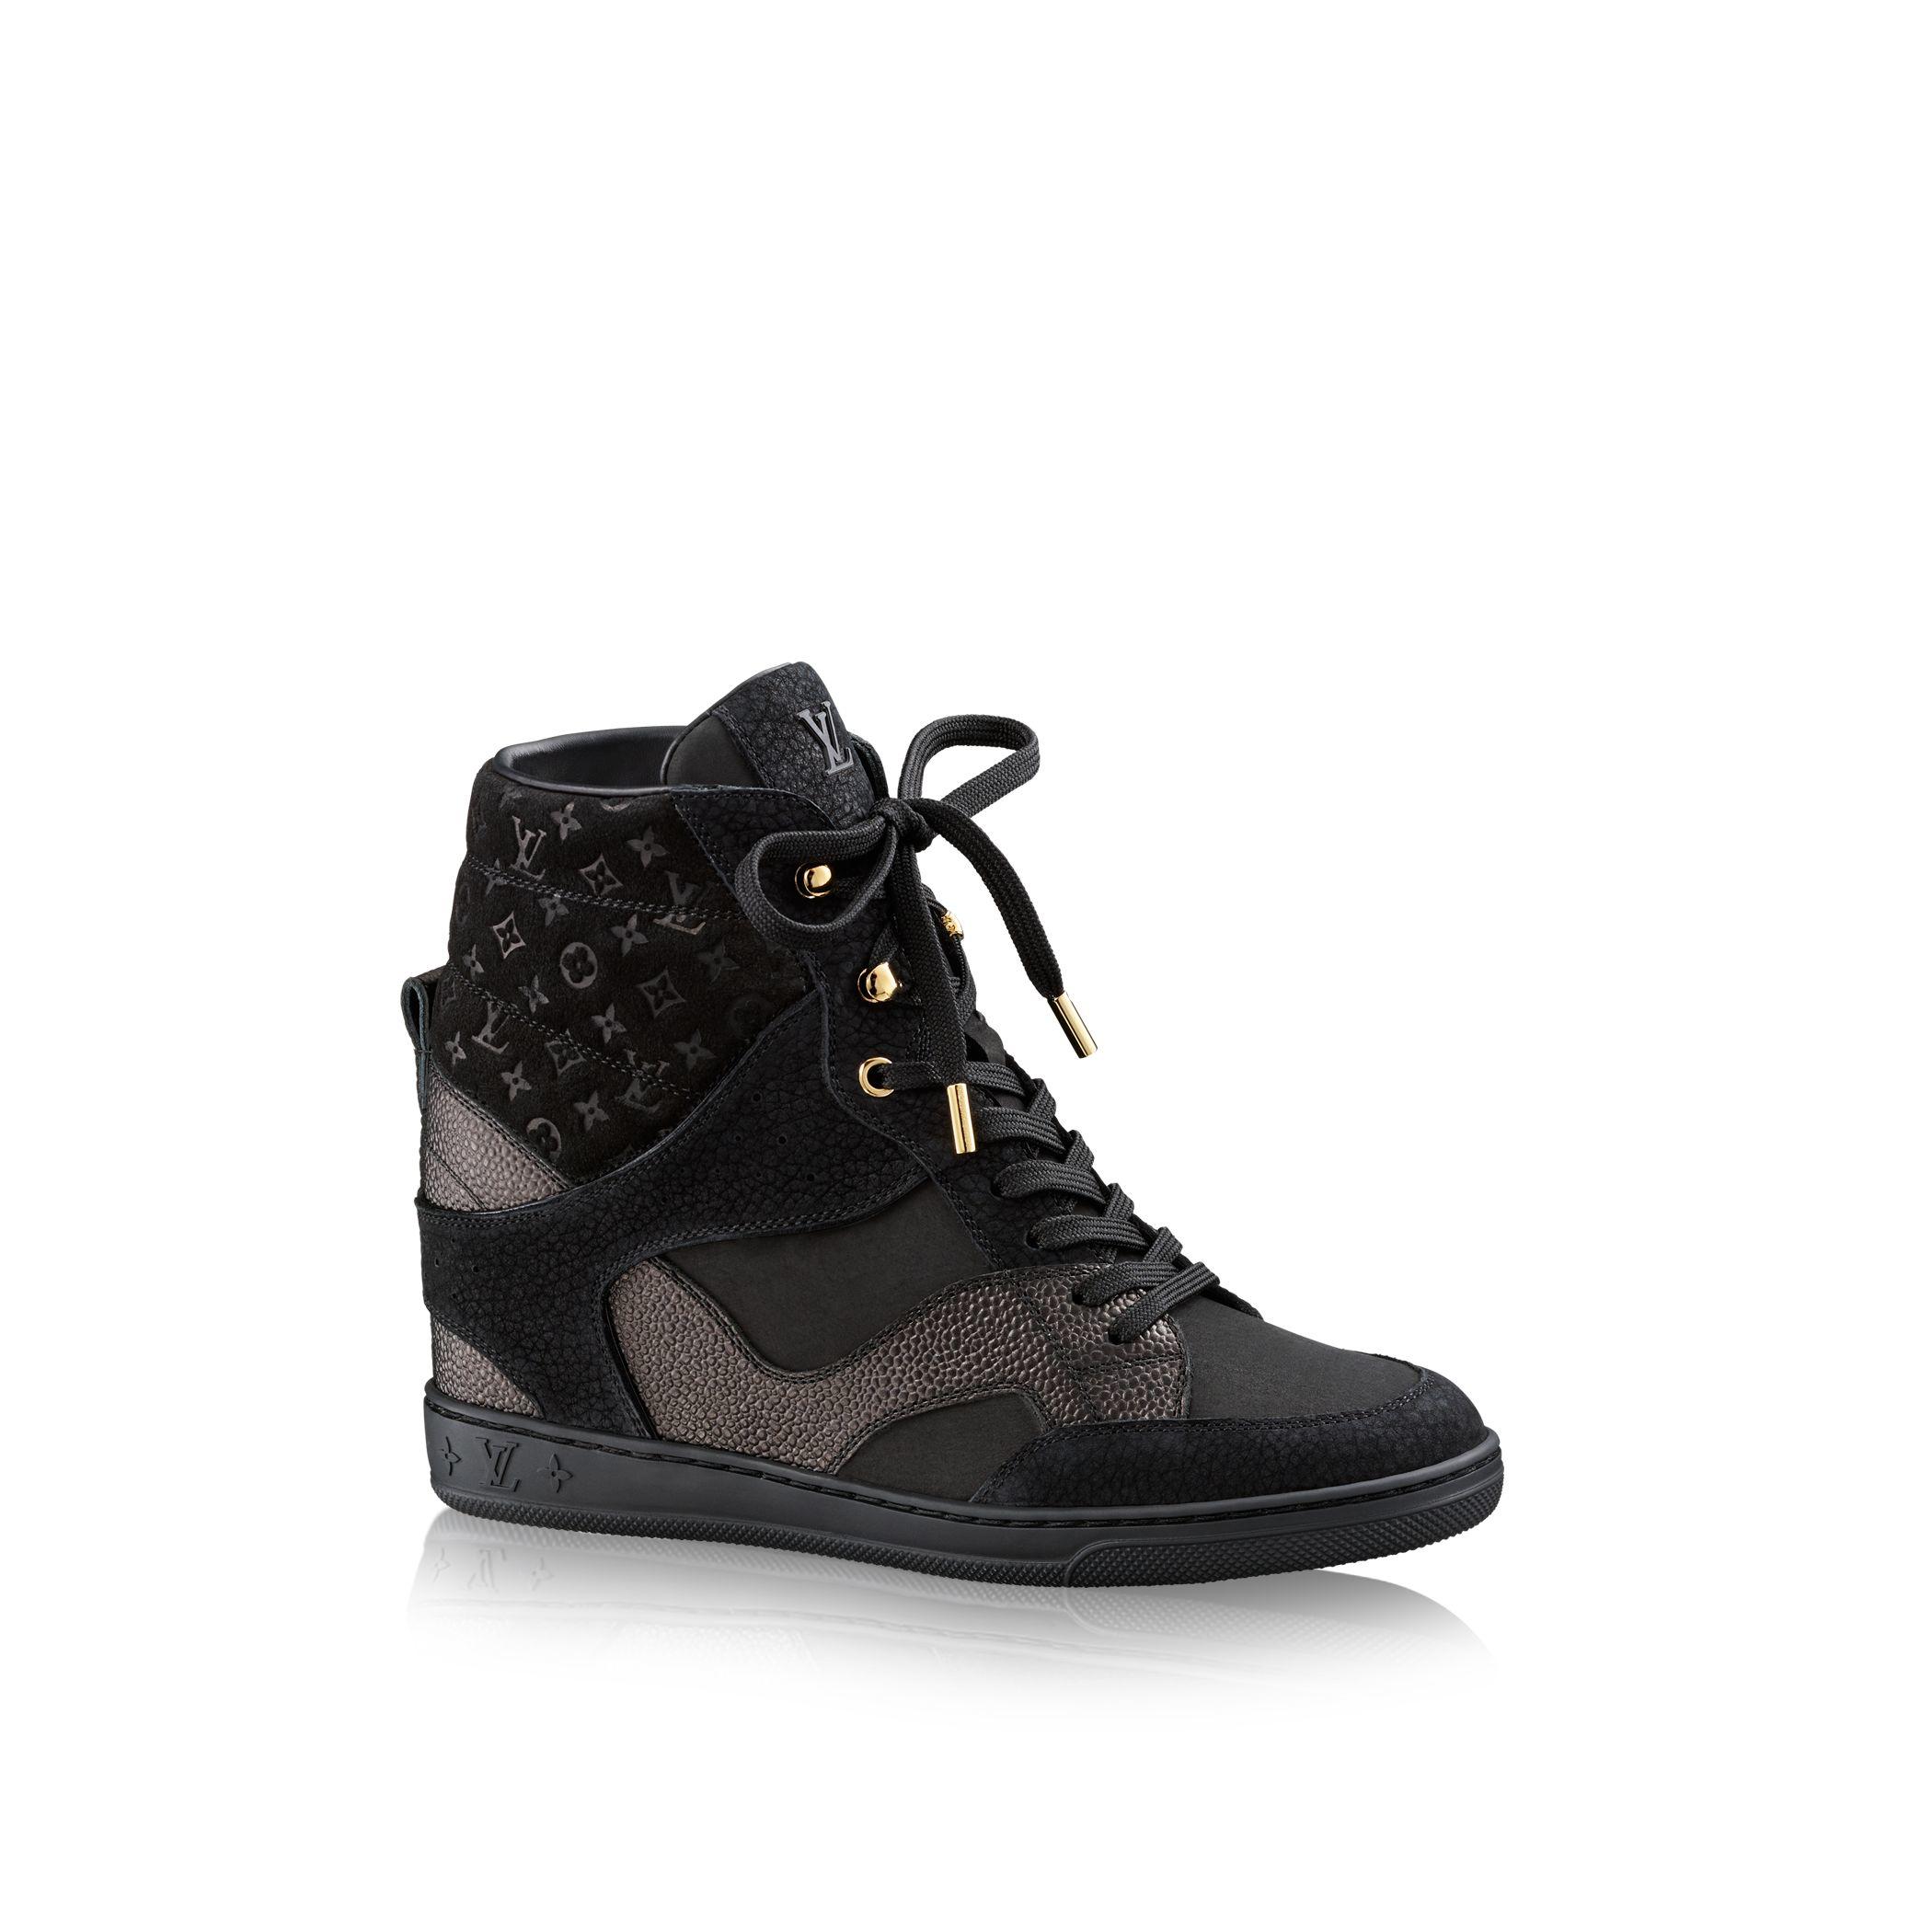 louis vuitton cliff top sneaker boot in black lyst